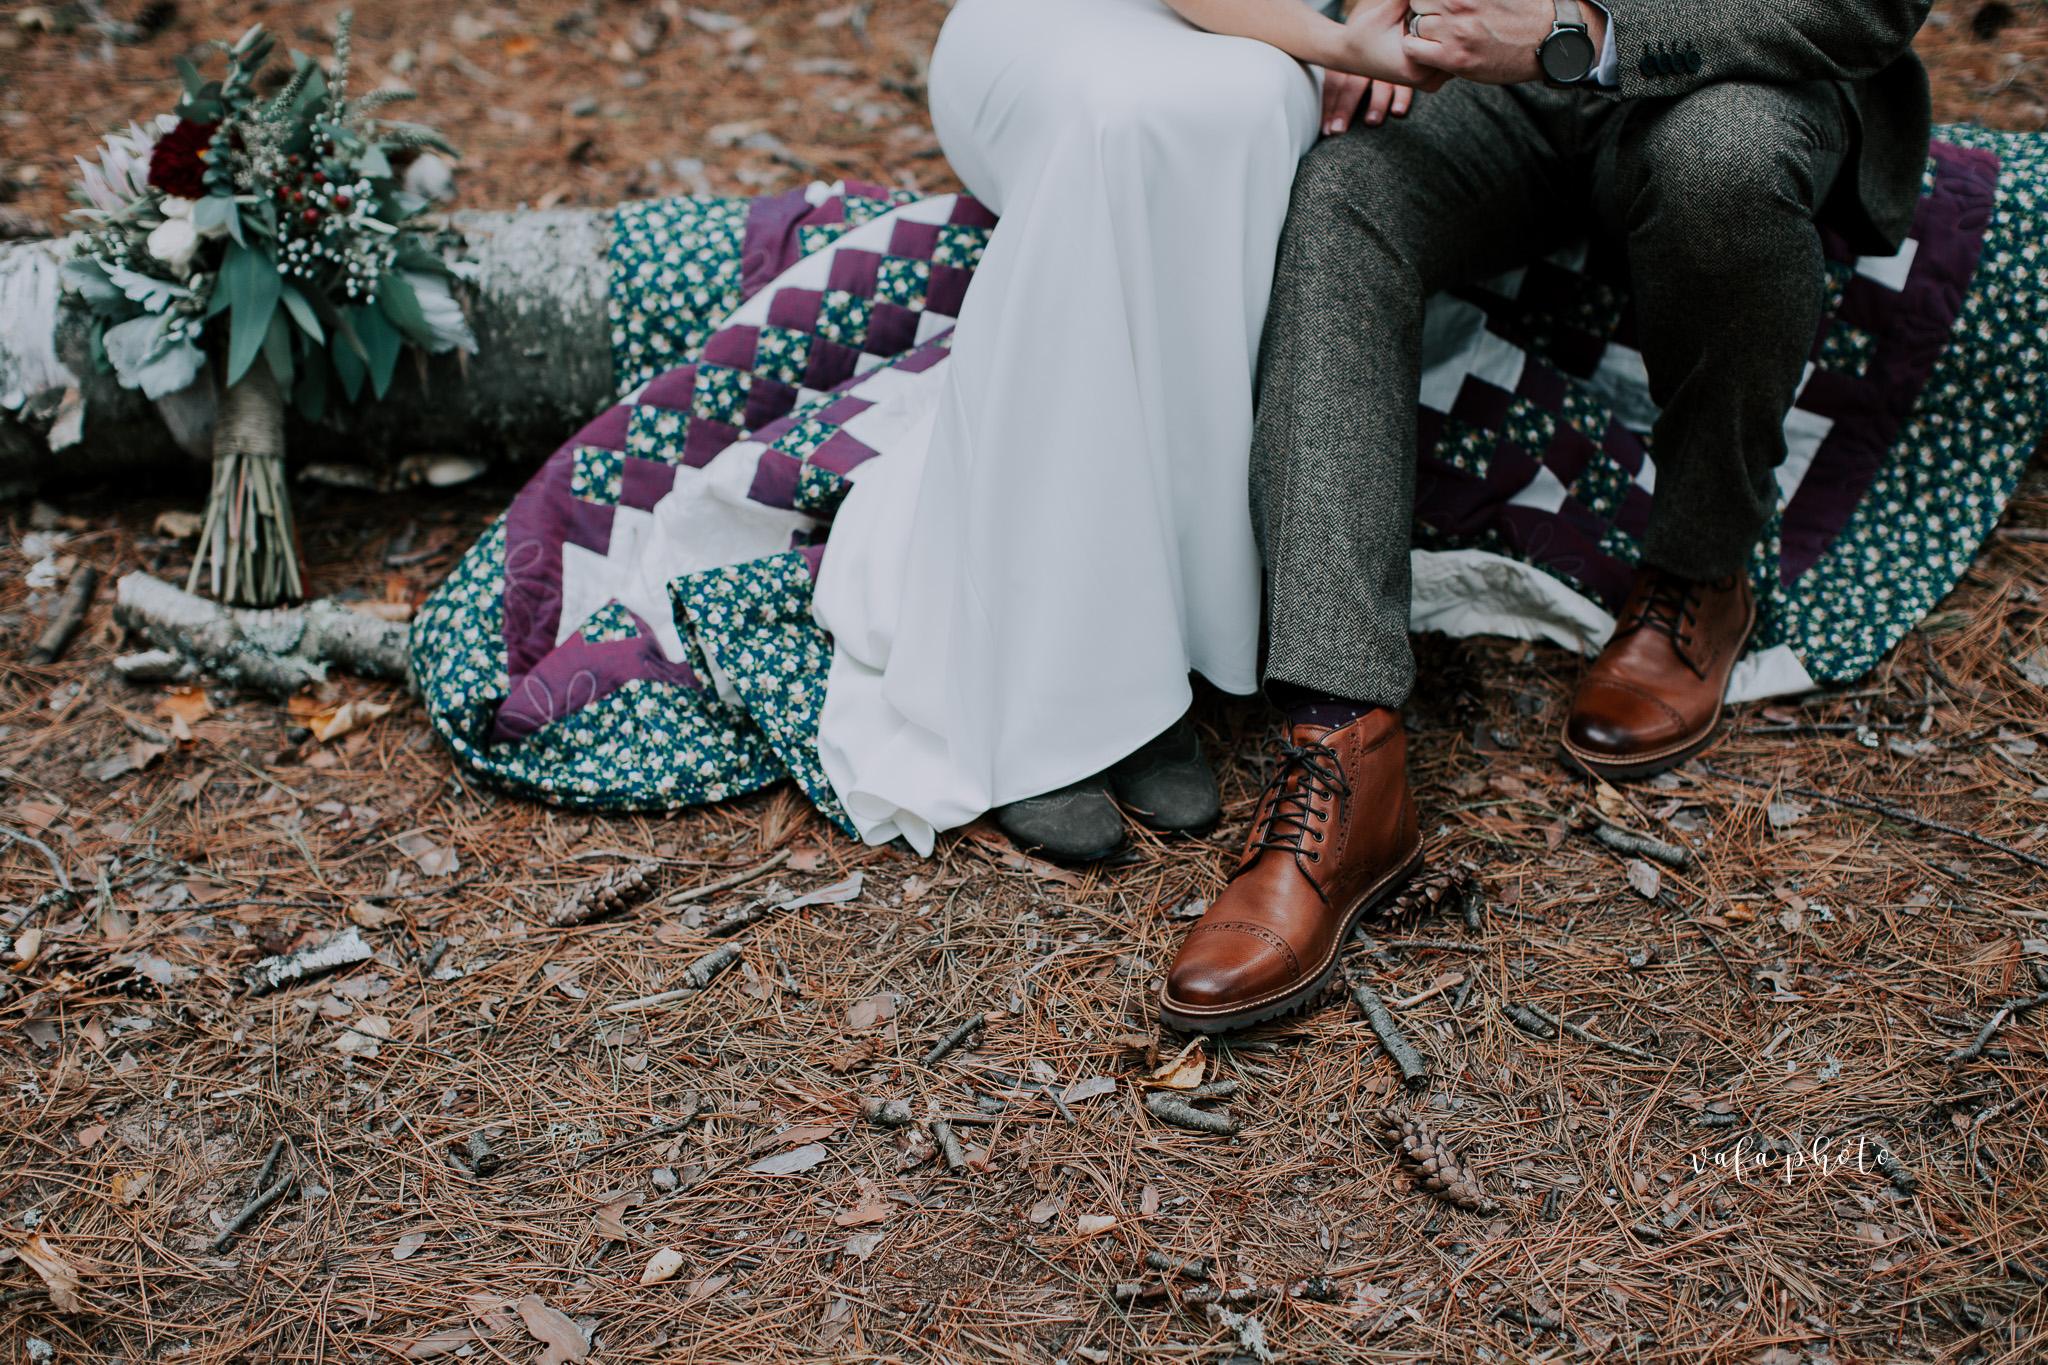 Little-Presque-Isle-Michigan-Wedding-Kim-Kyle-Vafa-Photo-406.jpg